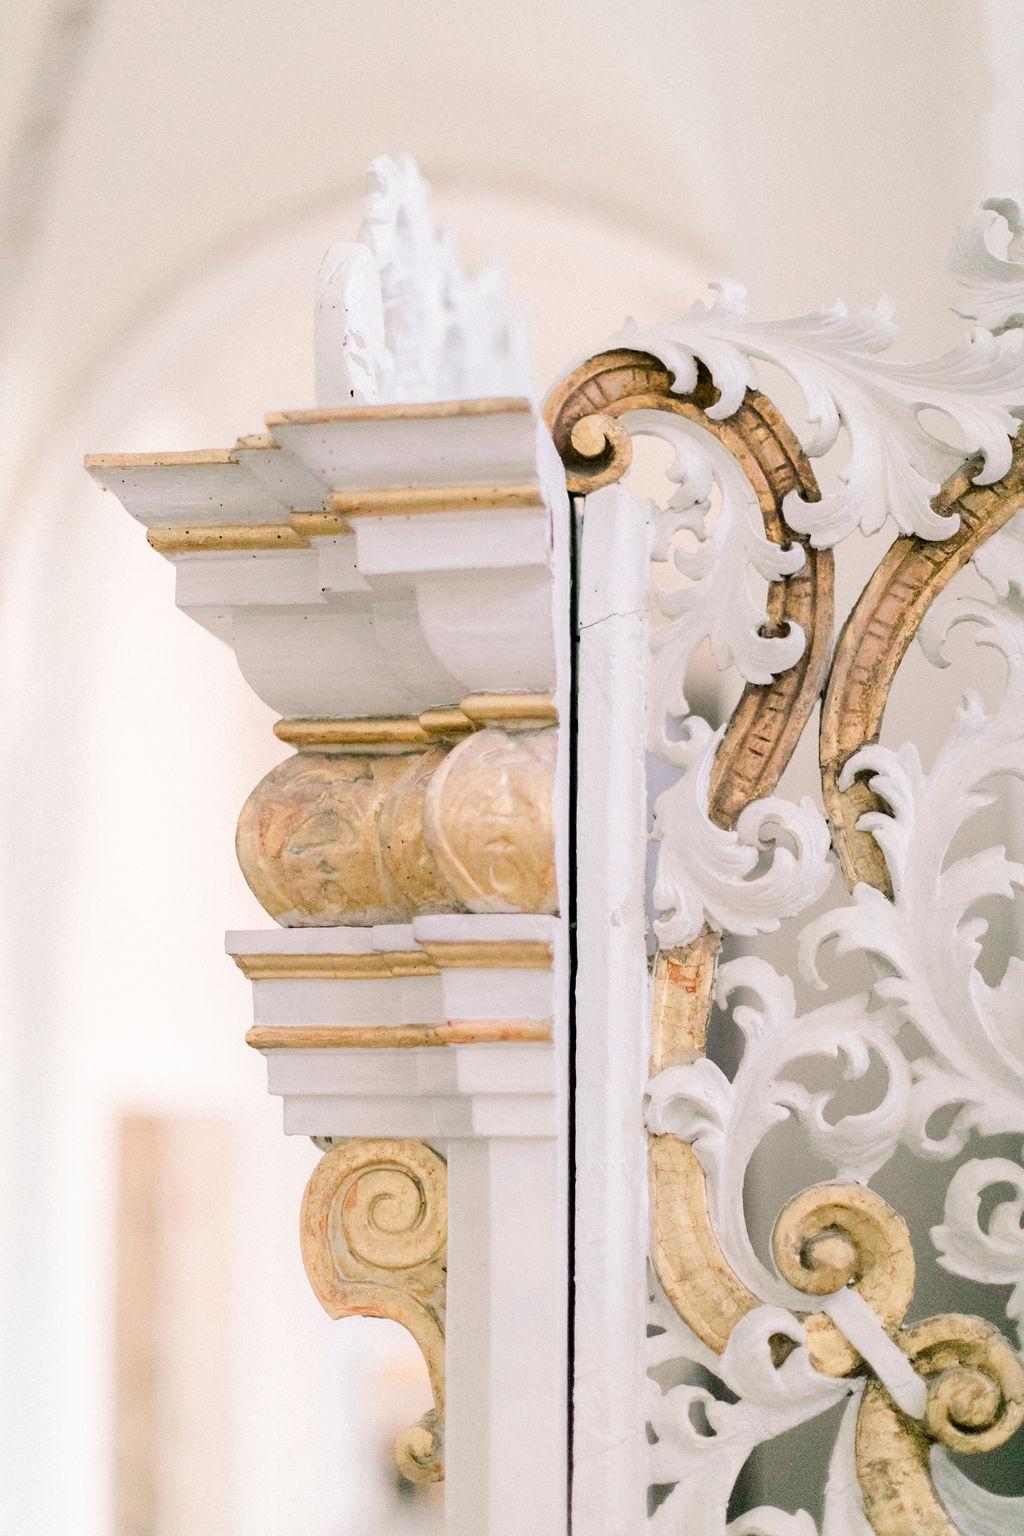 baroque ornaments, kloster wöltingerode, church wedding, wedding in germany